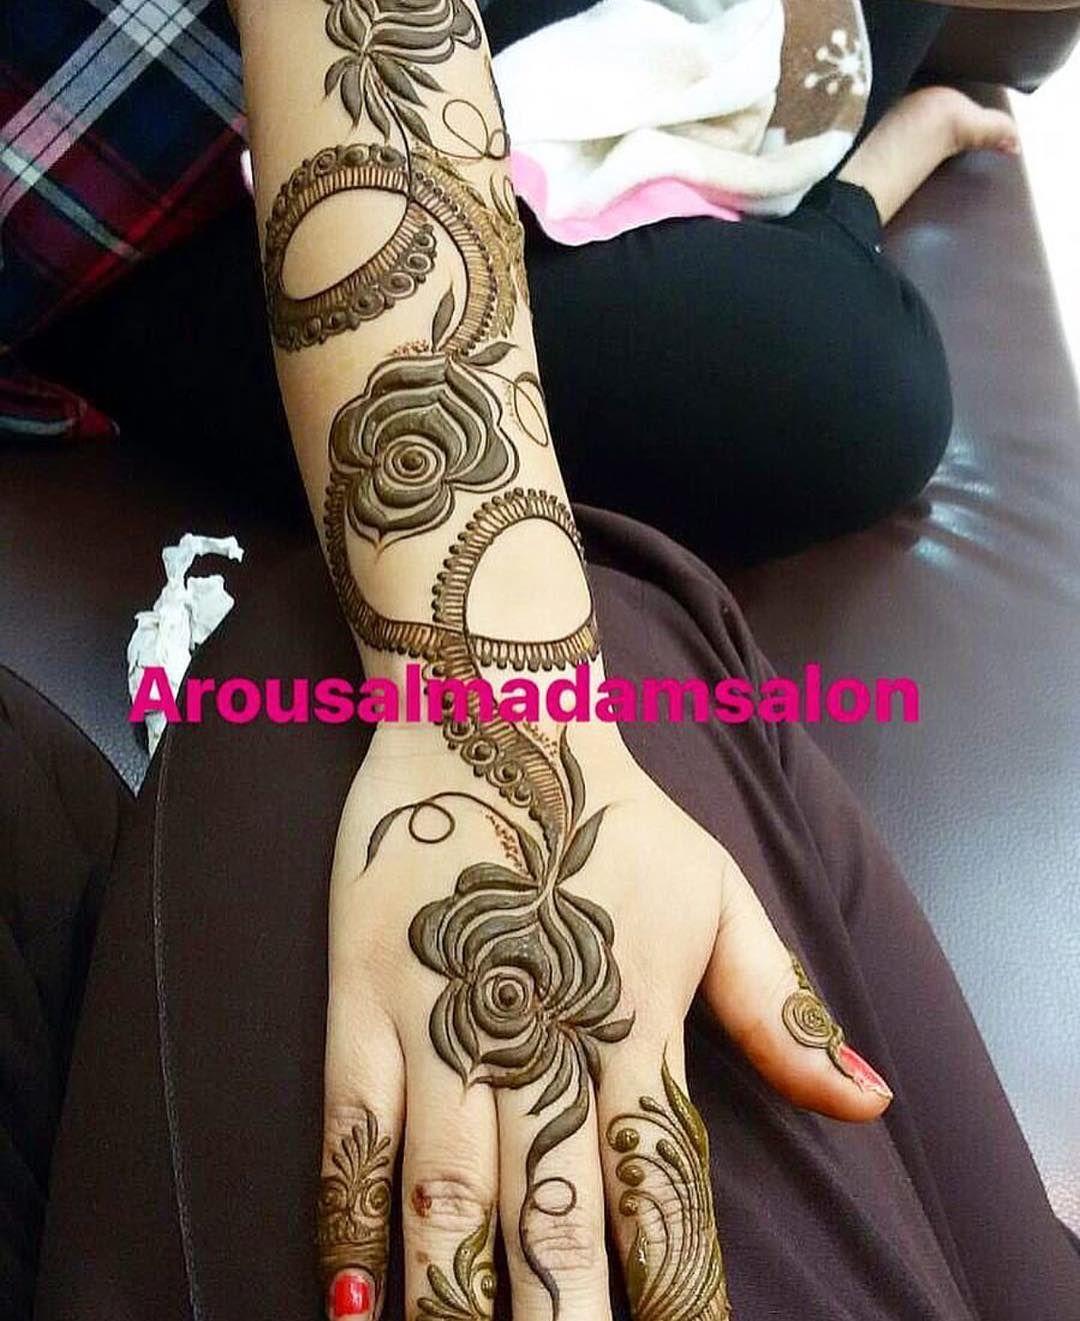 Pin By حبيب الروح On Henna Rose Mehndi Designs Mehndi Designs Mehndi Designs For Hands